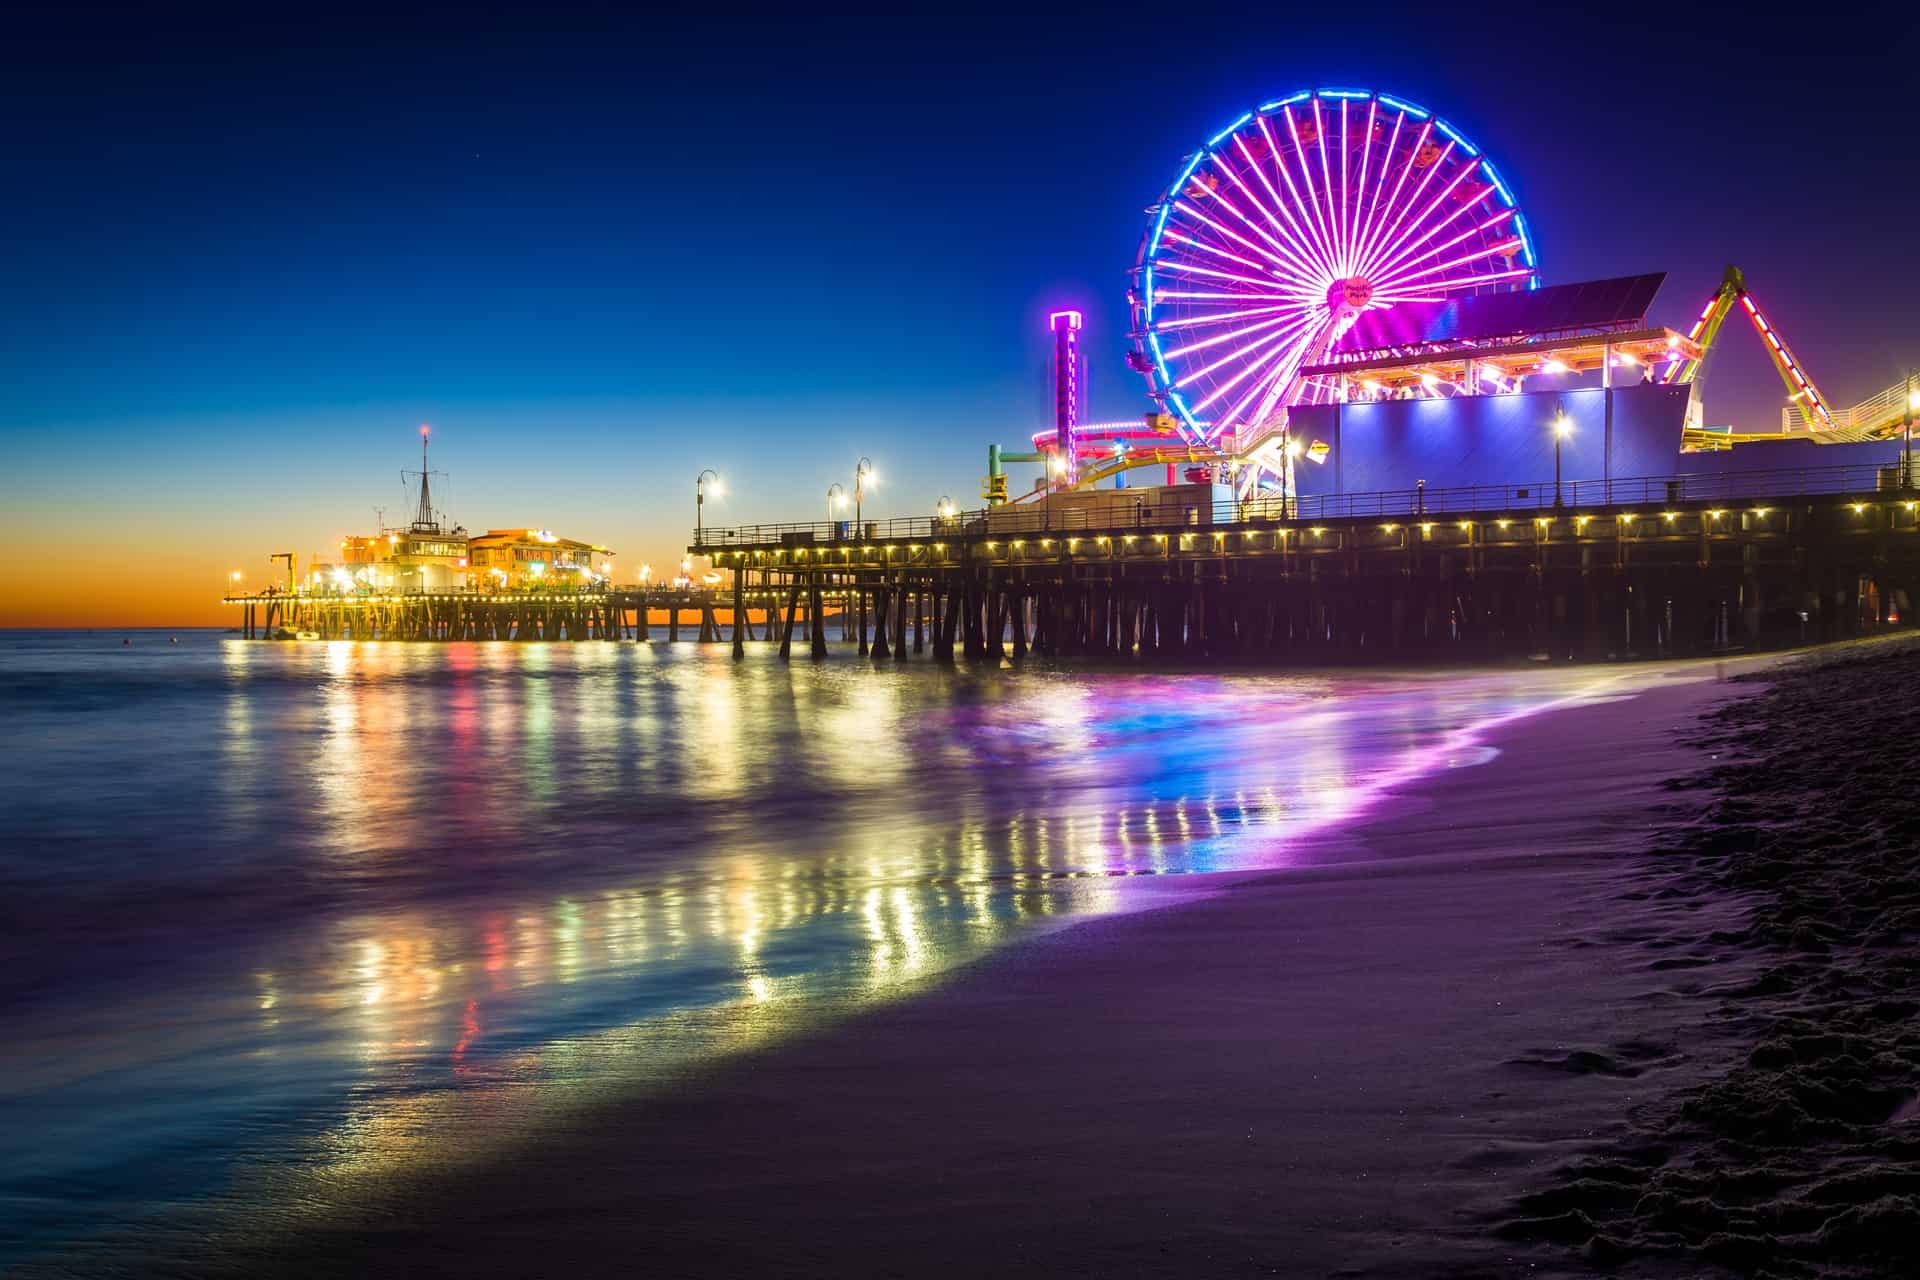 Hollywood Bus Tours - Santa Monica Pier